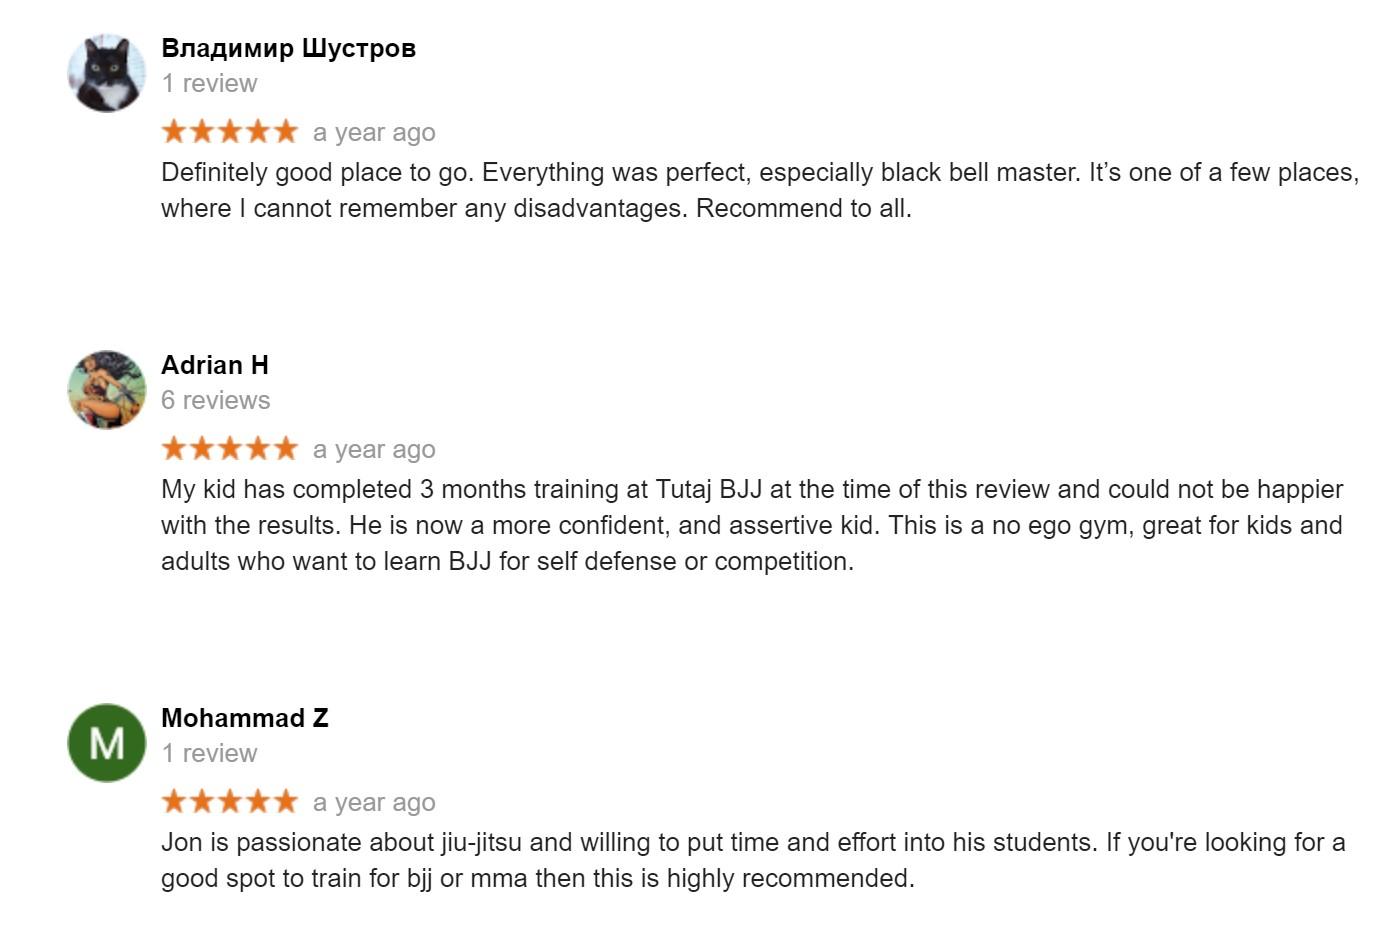 reviews05.jpg